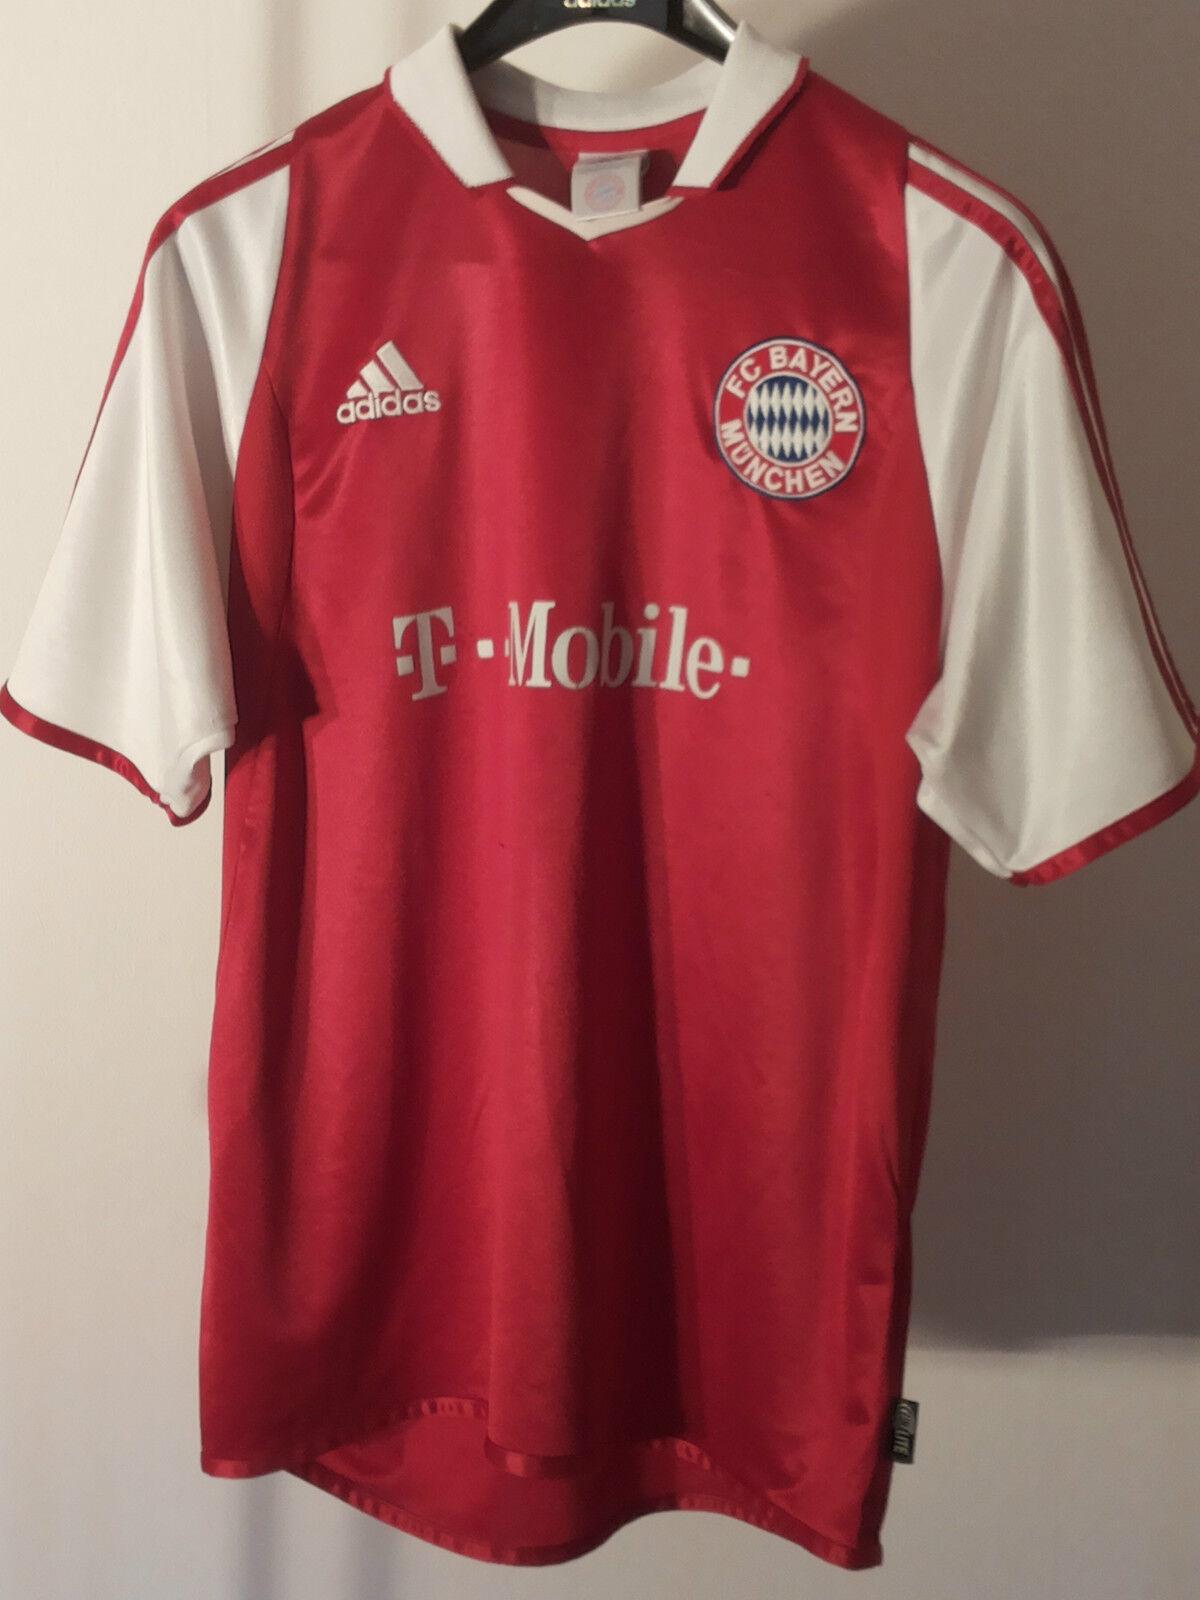 Original Adidas Bayern München Makaay Trikot Gr 176 S 2003 2003 2003 05  Champions League 81f737